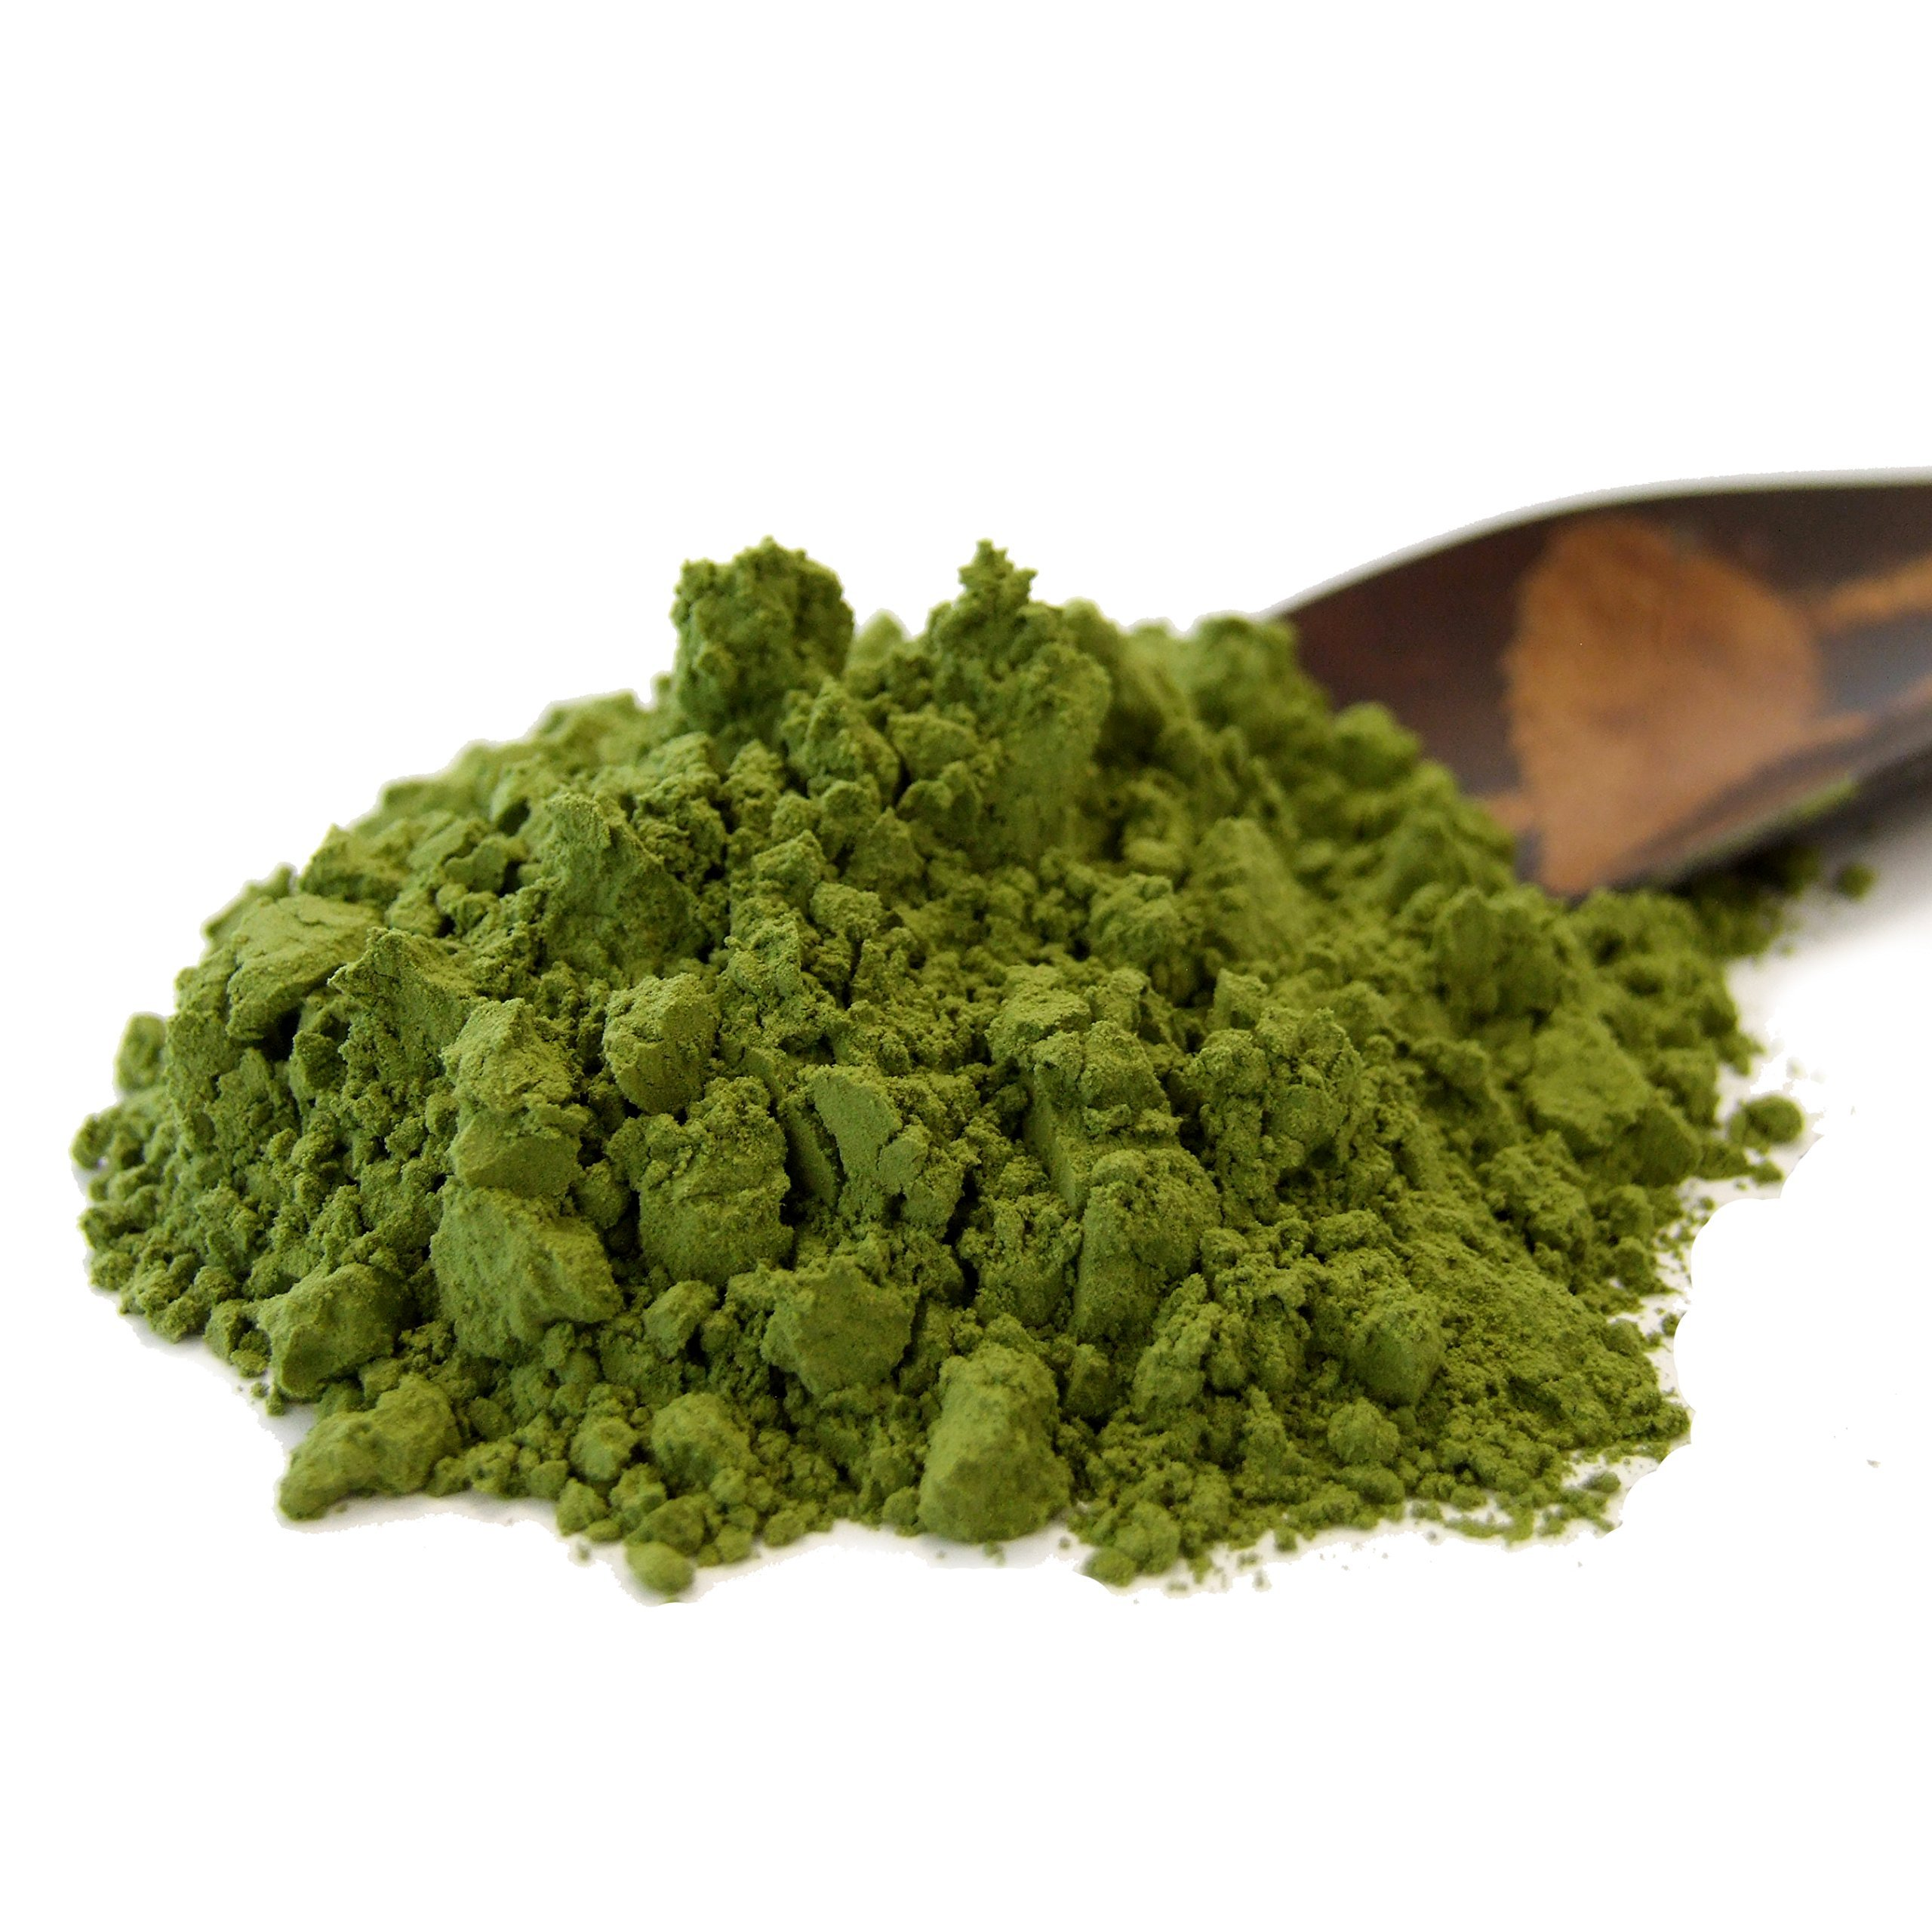 The Tea Makers of London Organic Ceremonial Grade Japanese Matcha Green Tea Powder (250G Catering Pack)